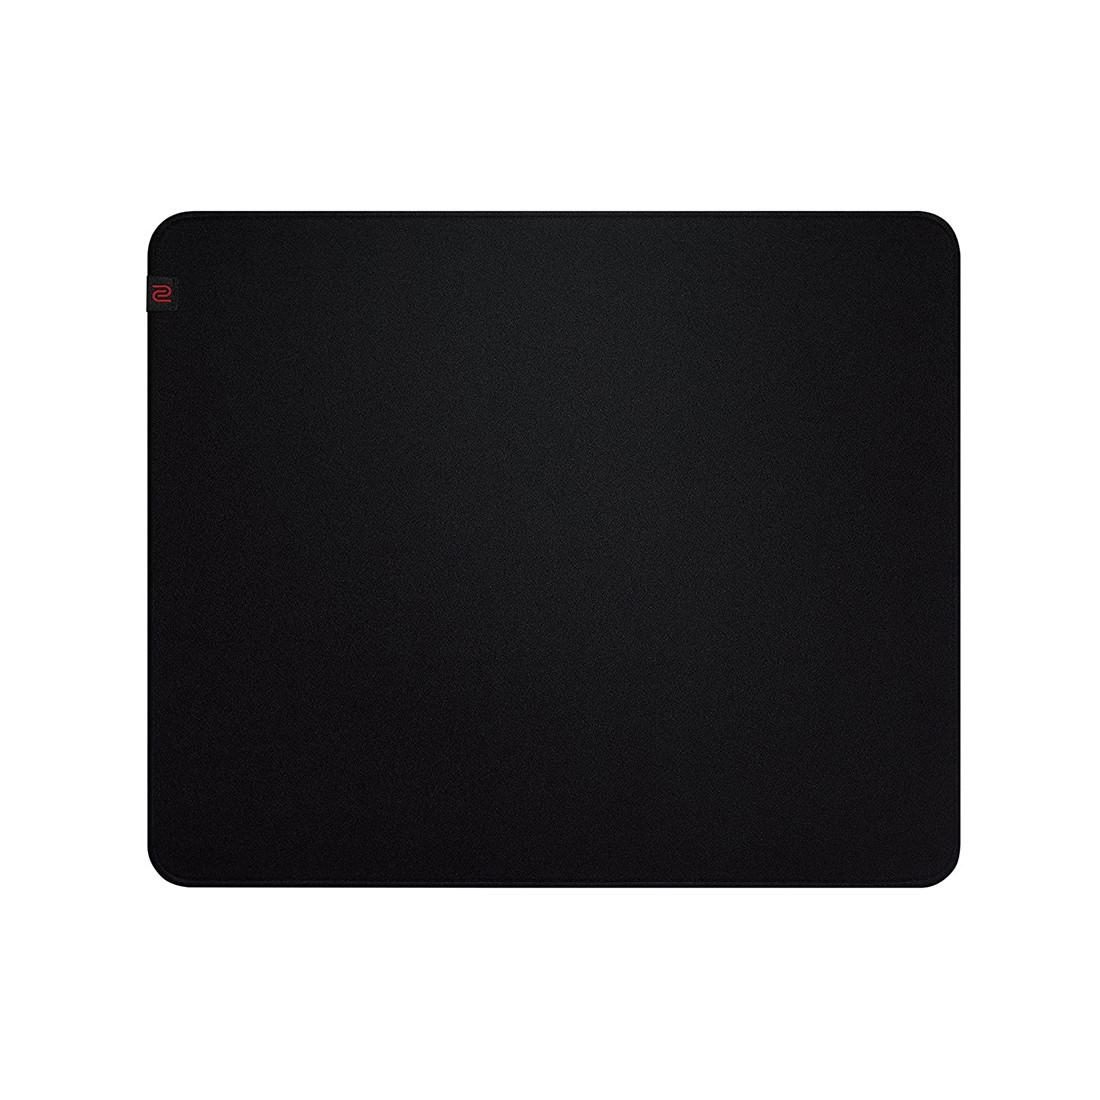 Коврик для компьютерной мыши ZOWIE GTF-X